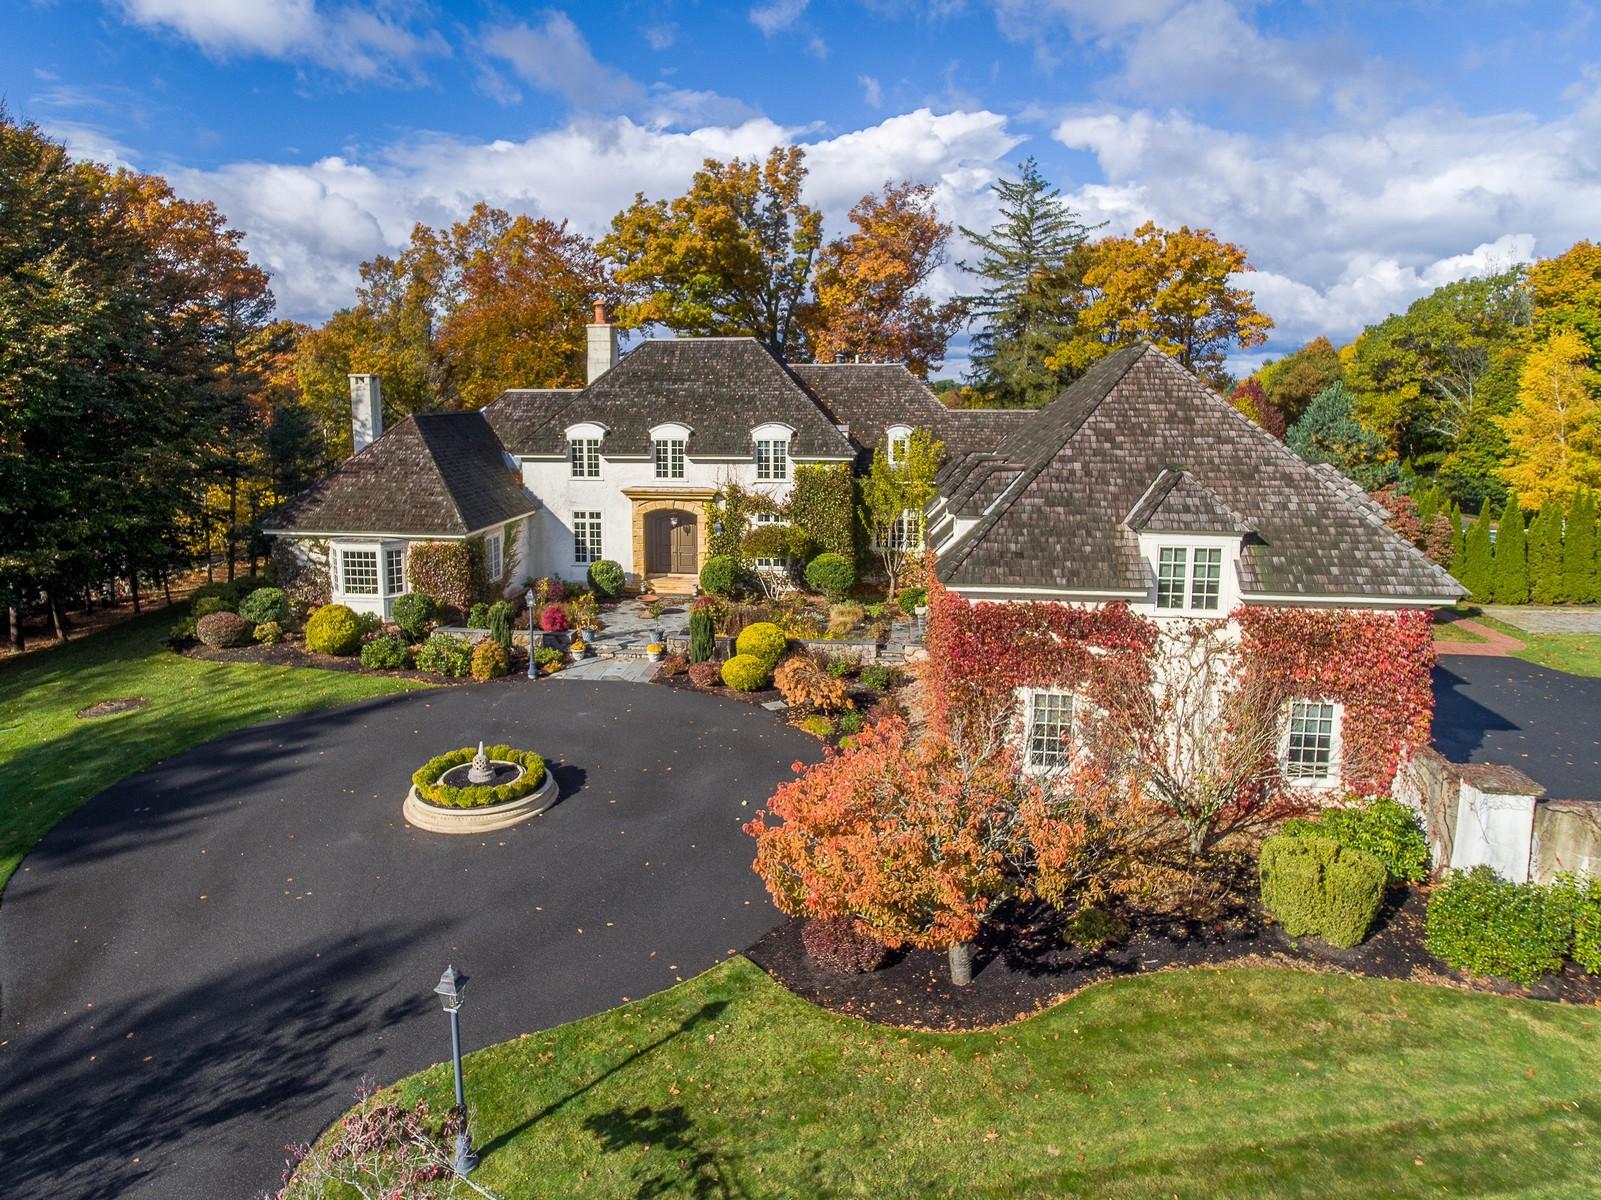 独户住宅 为 销售 在 French Country Manor 57 Walnut Road 温翰姆, 马萨诸塞州 01984 美国